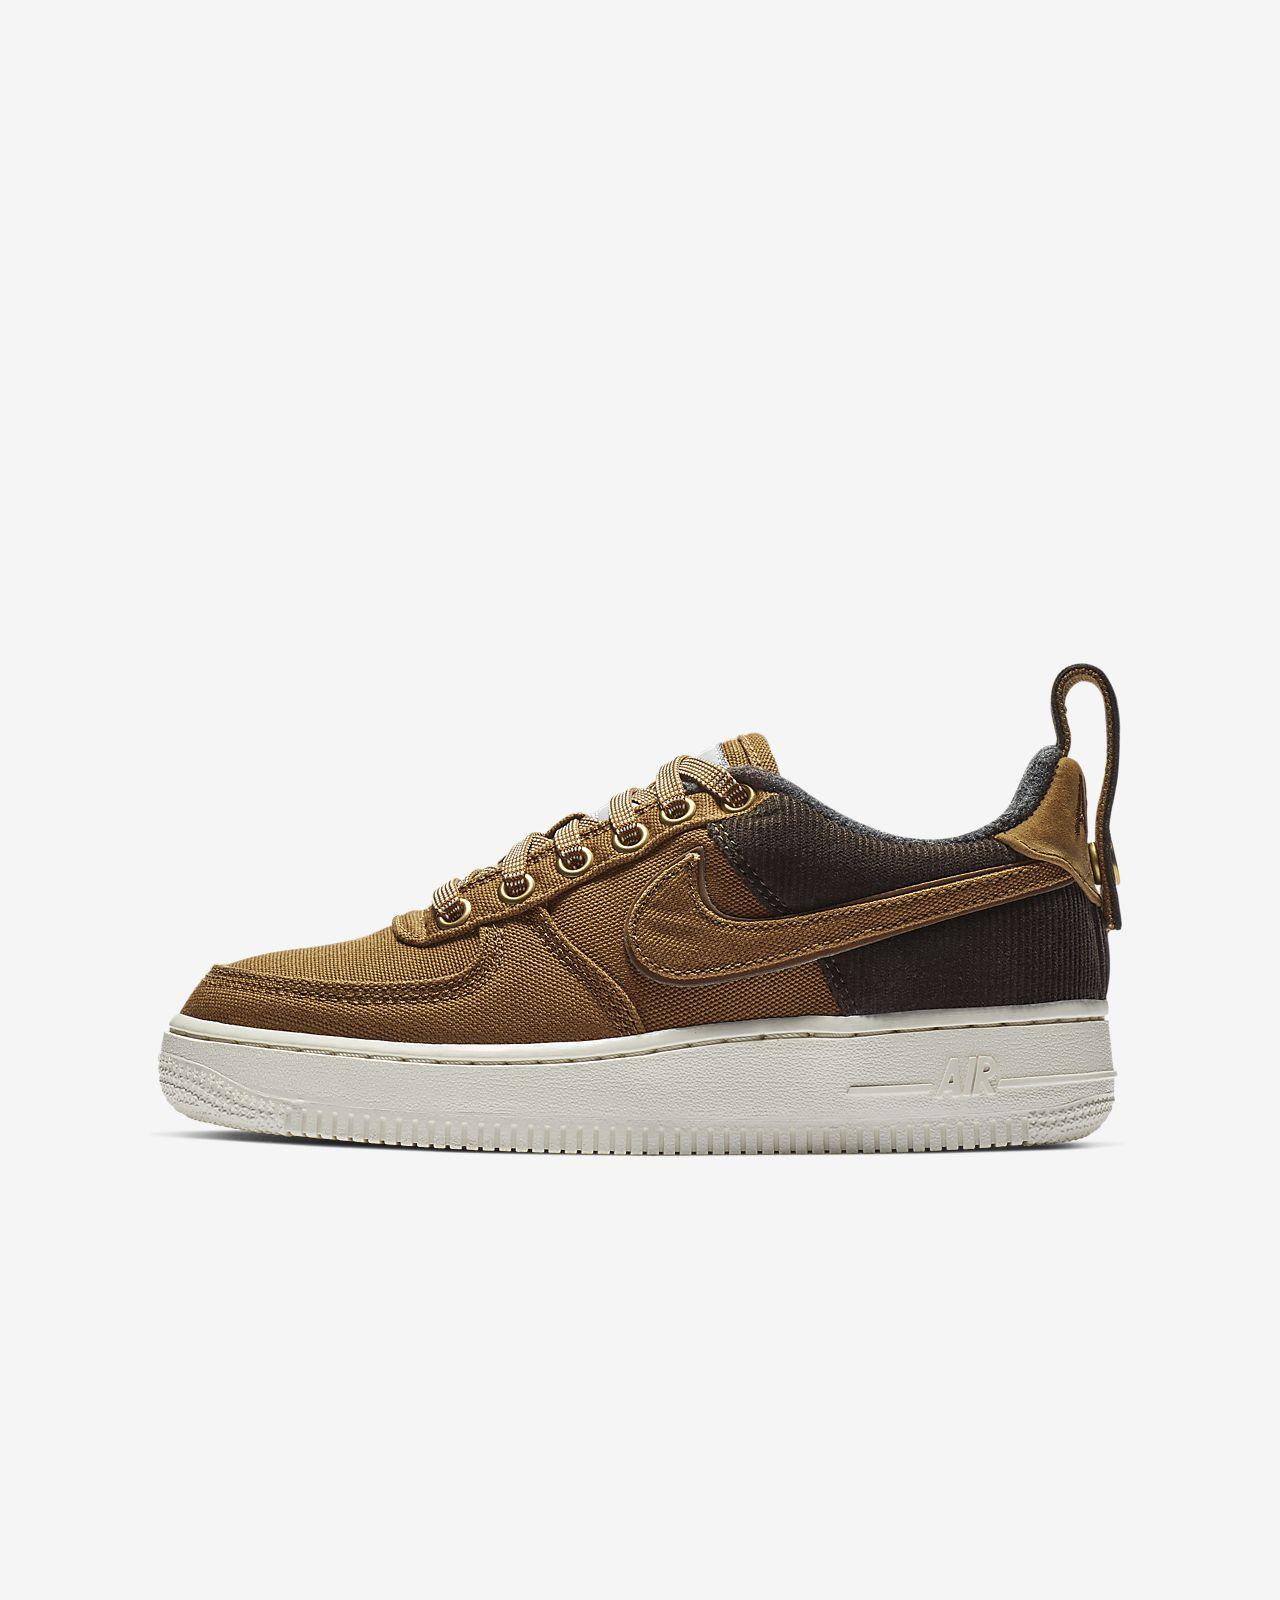 Schuh WIP Premium ältere Air 1 für Force Kinder Nike j45RLA